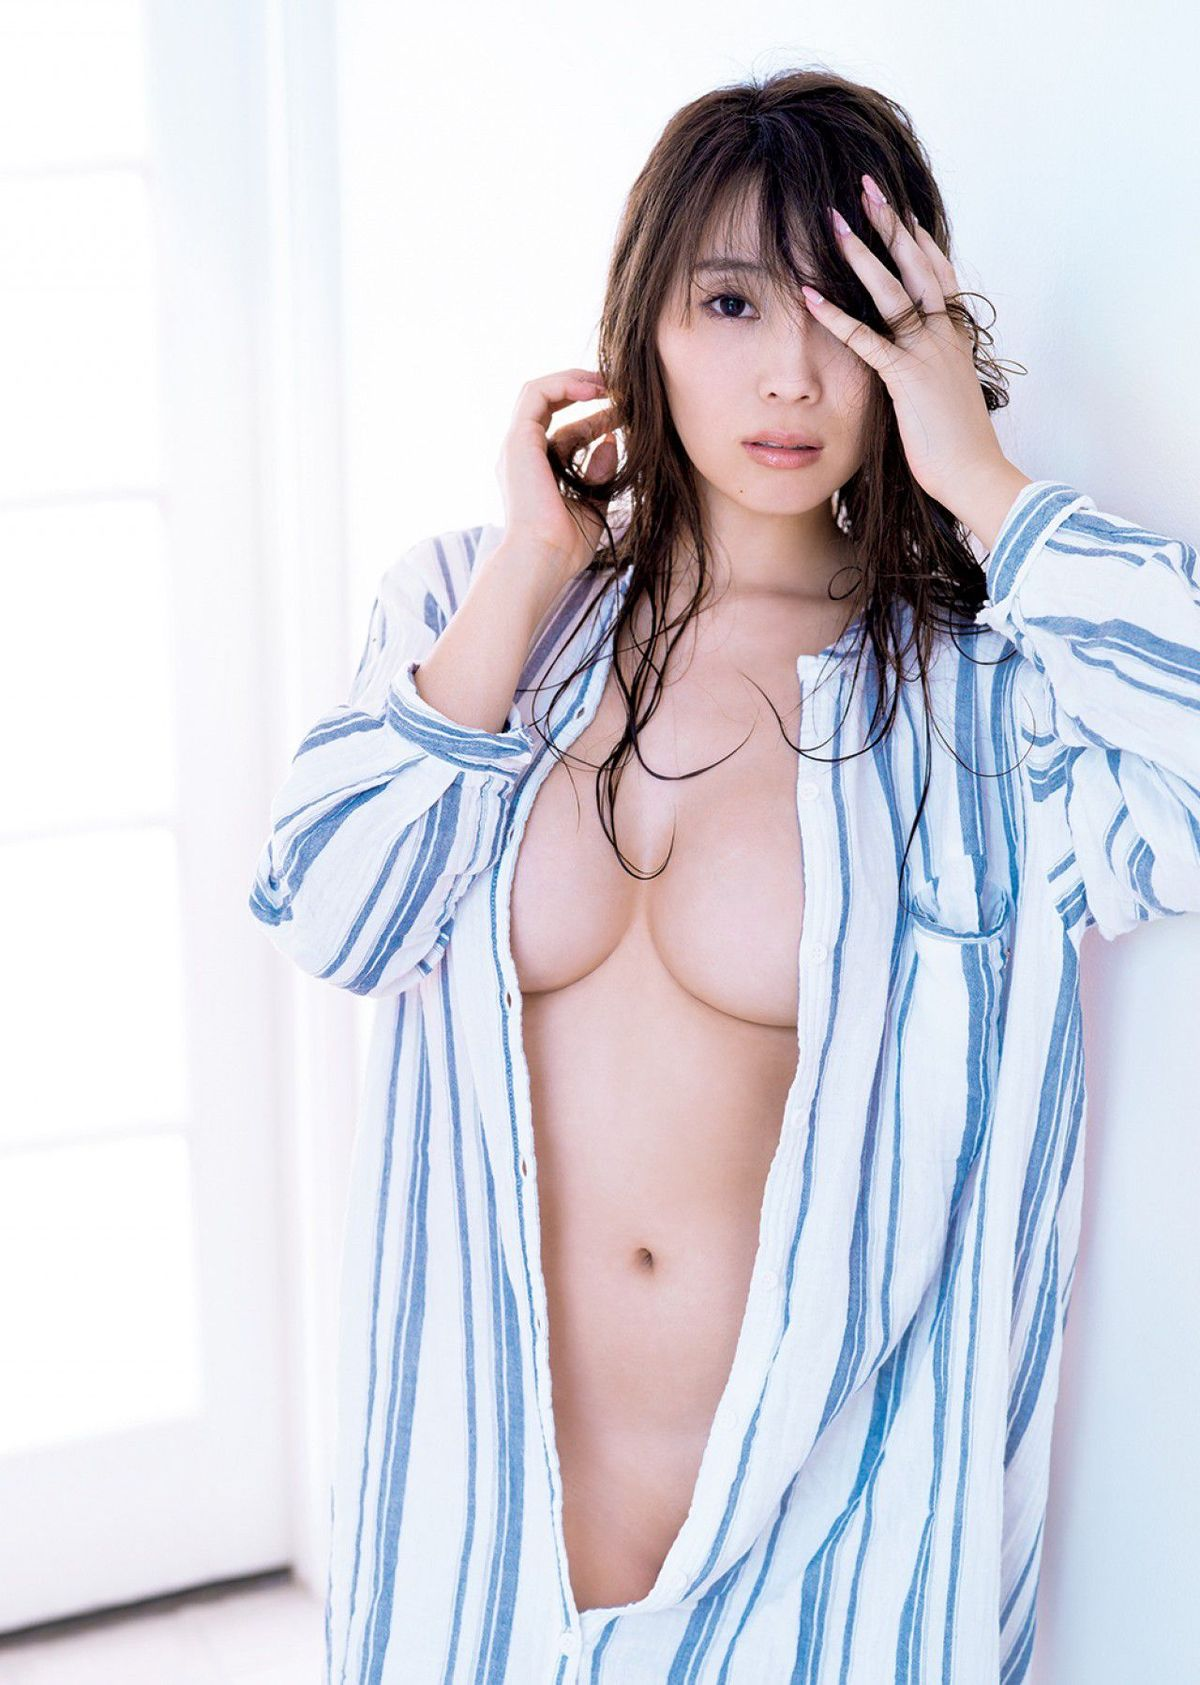 [FRIDAY] 森咲智美 《バストトップが透けて見えた!トップグラドルがついに》写真1